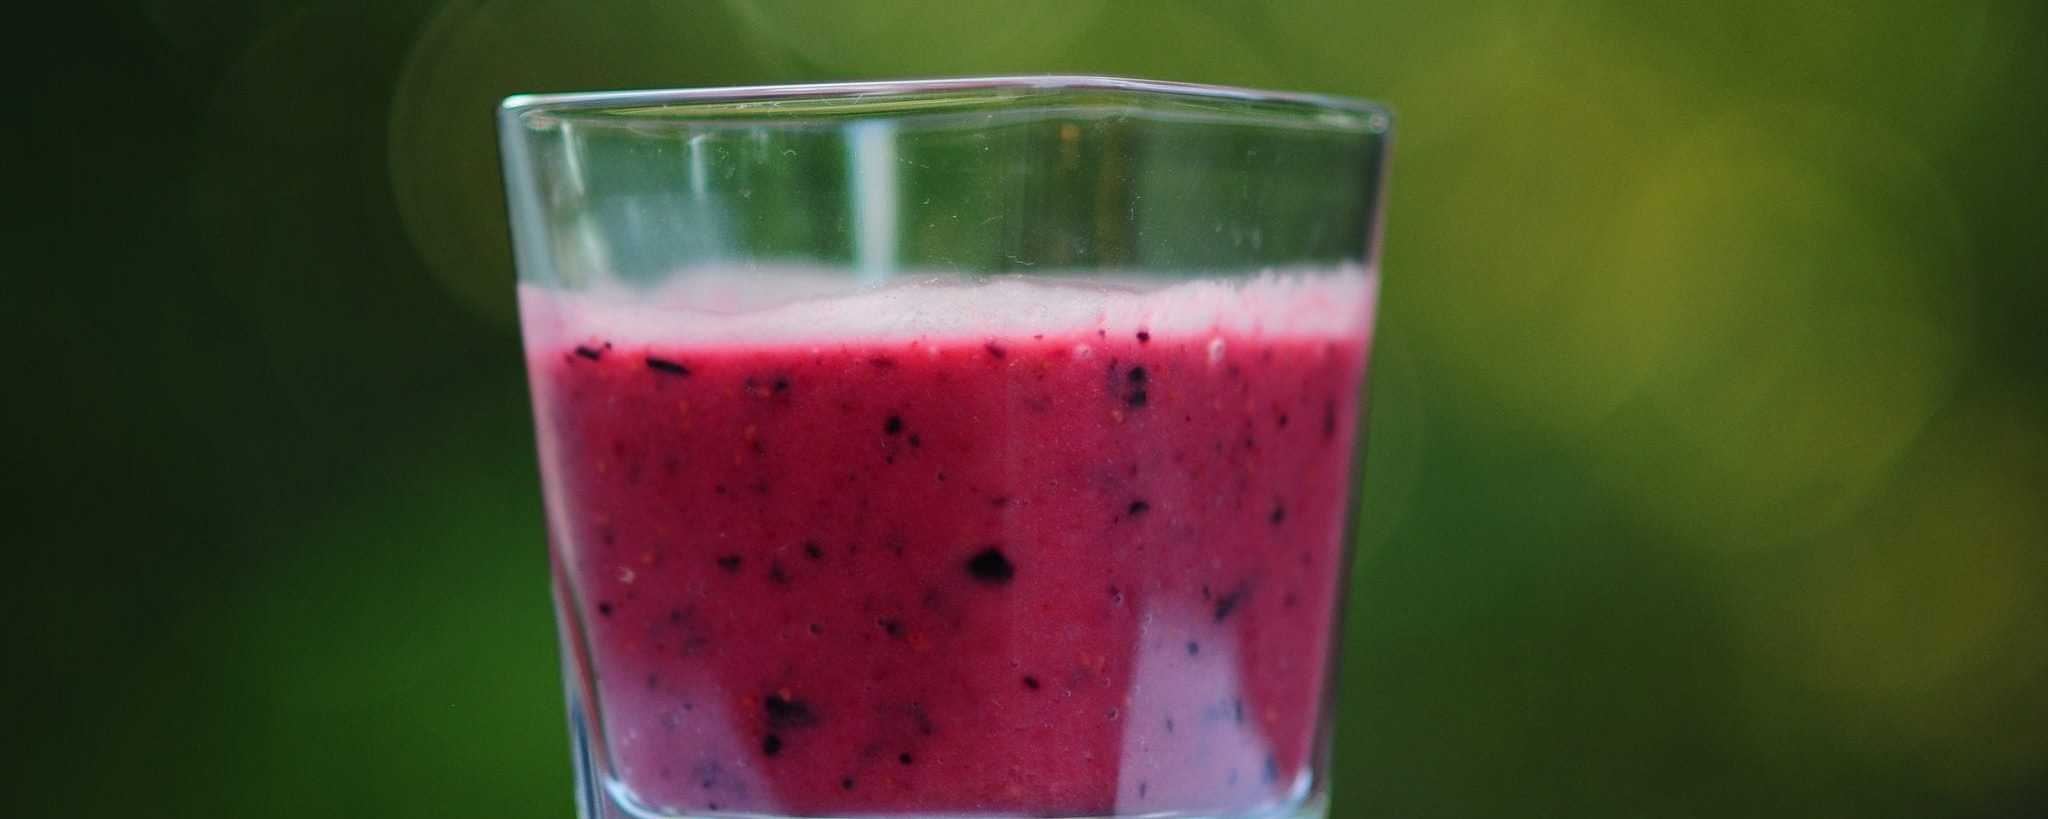 Food as Medicine: Coconut Berry Puree Recipe